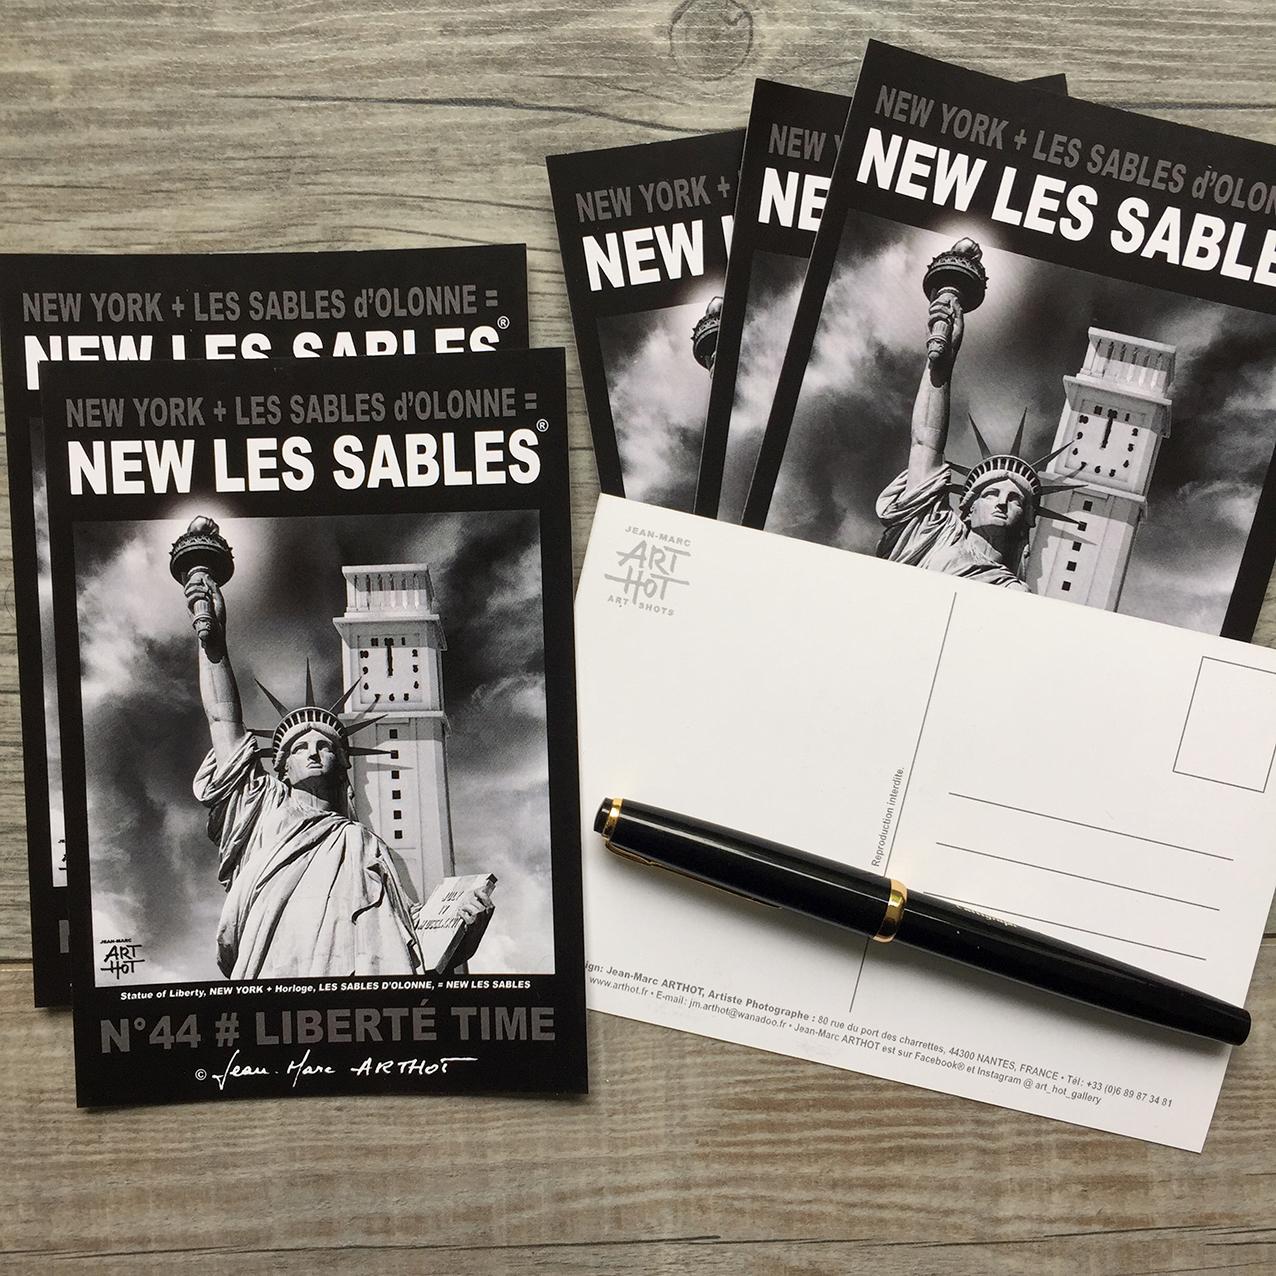 LOT D - 5 CARTES POSTALES - NEW LES SABLES - Liberté Time